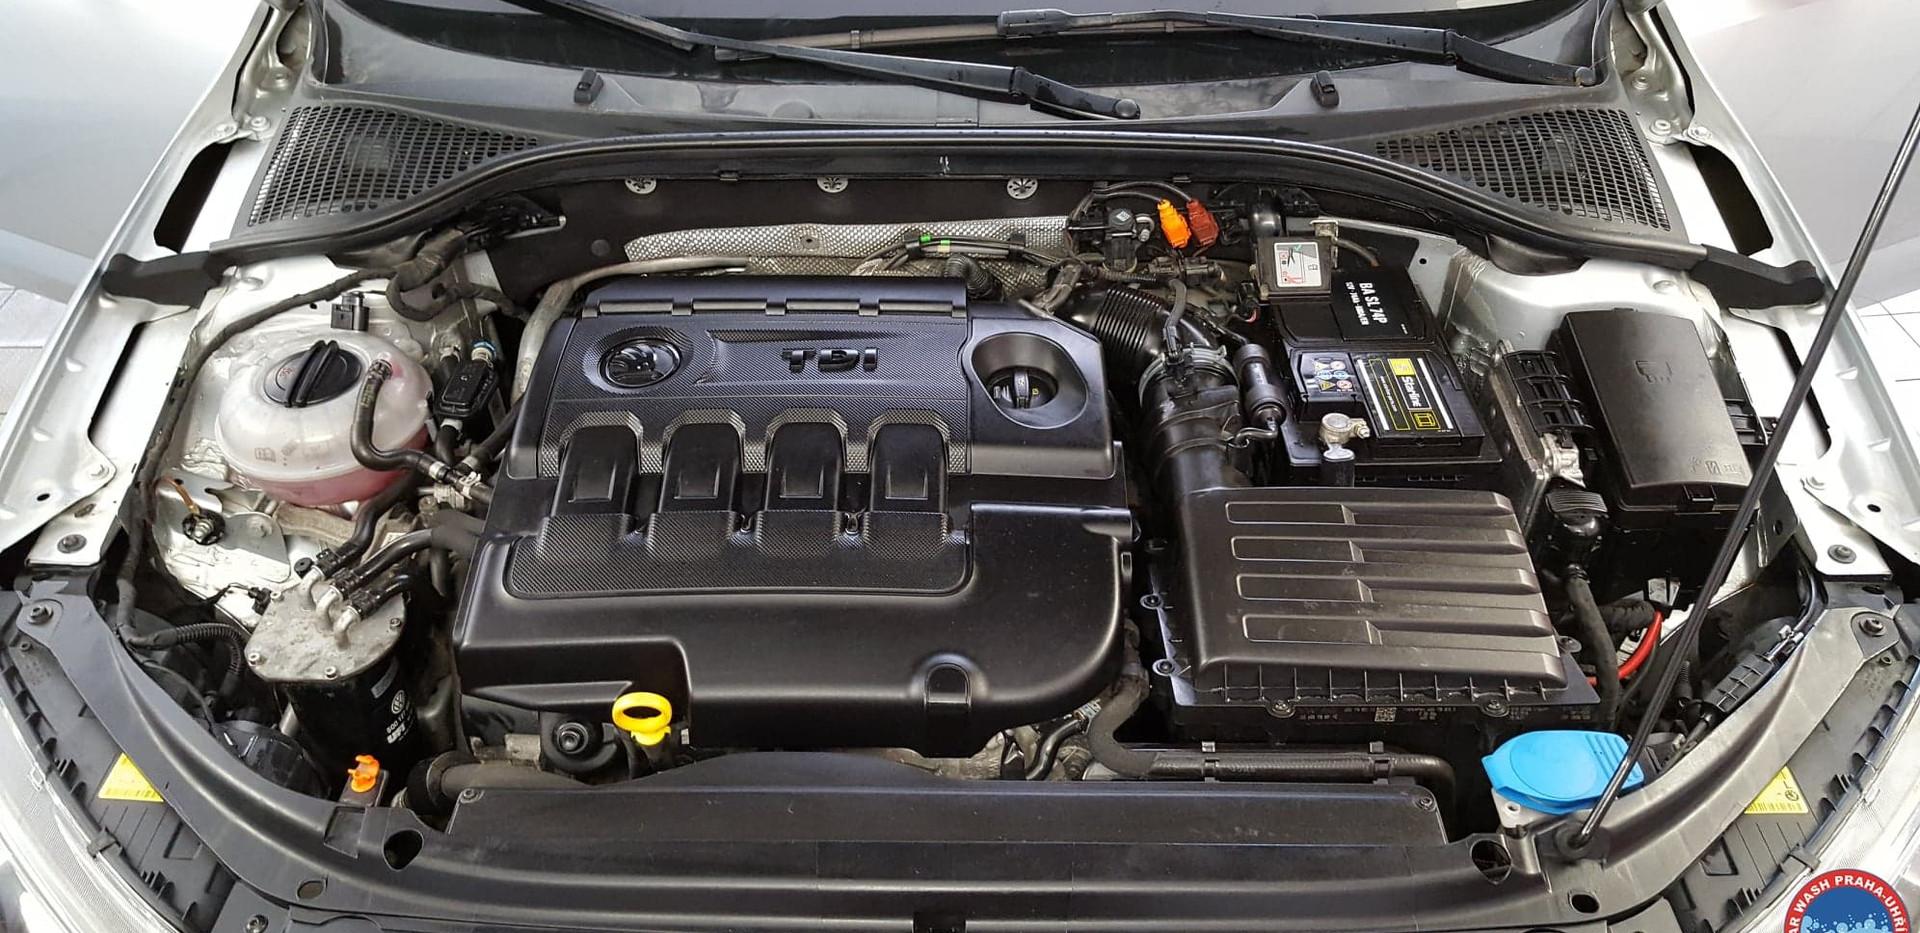 Car Wash - Cisteni motoru (13).jpg